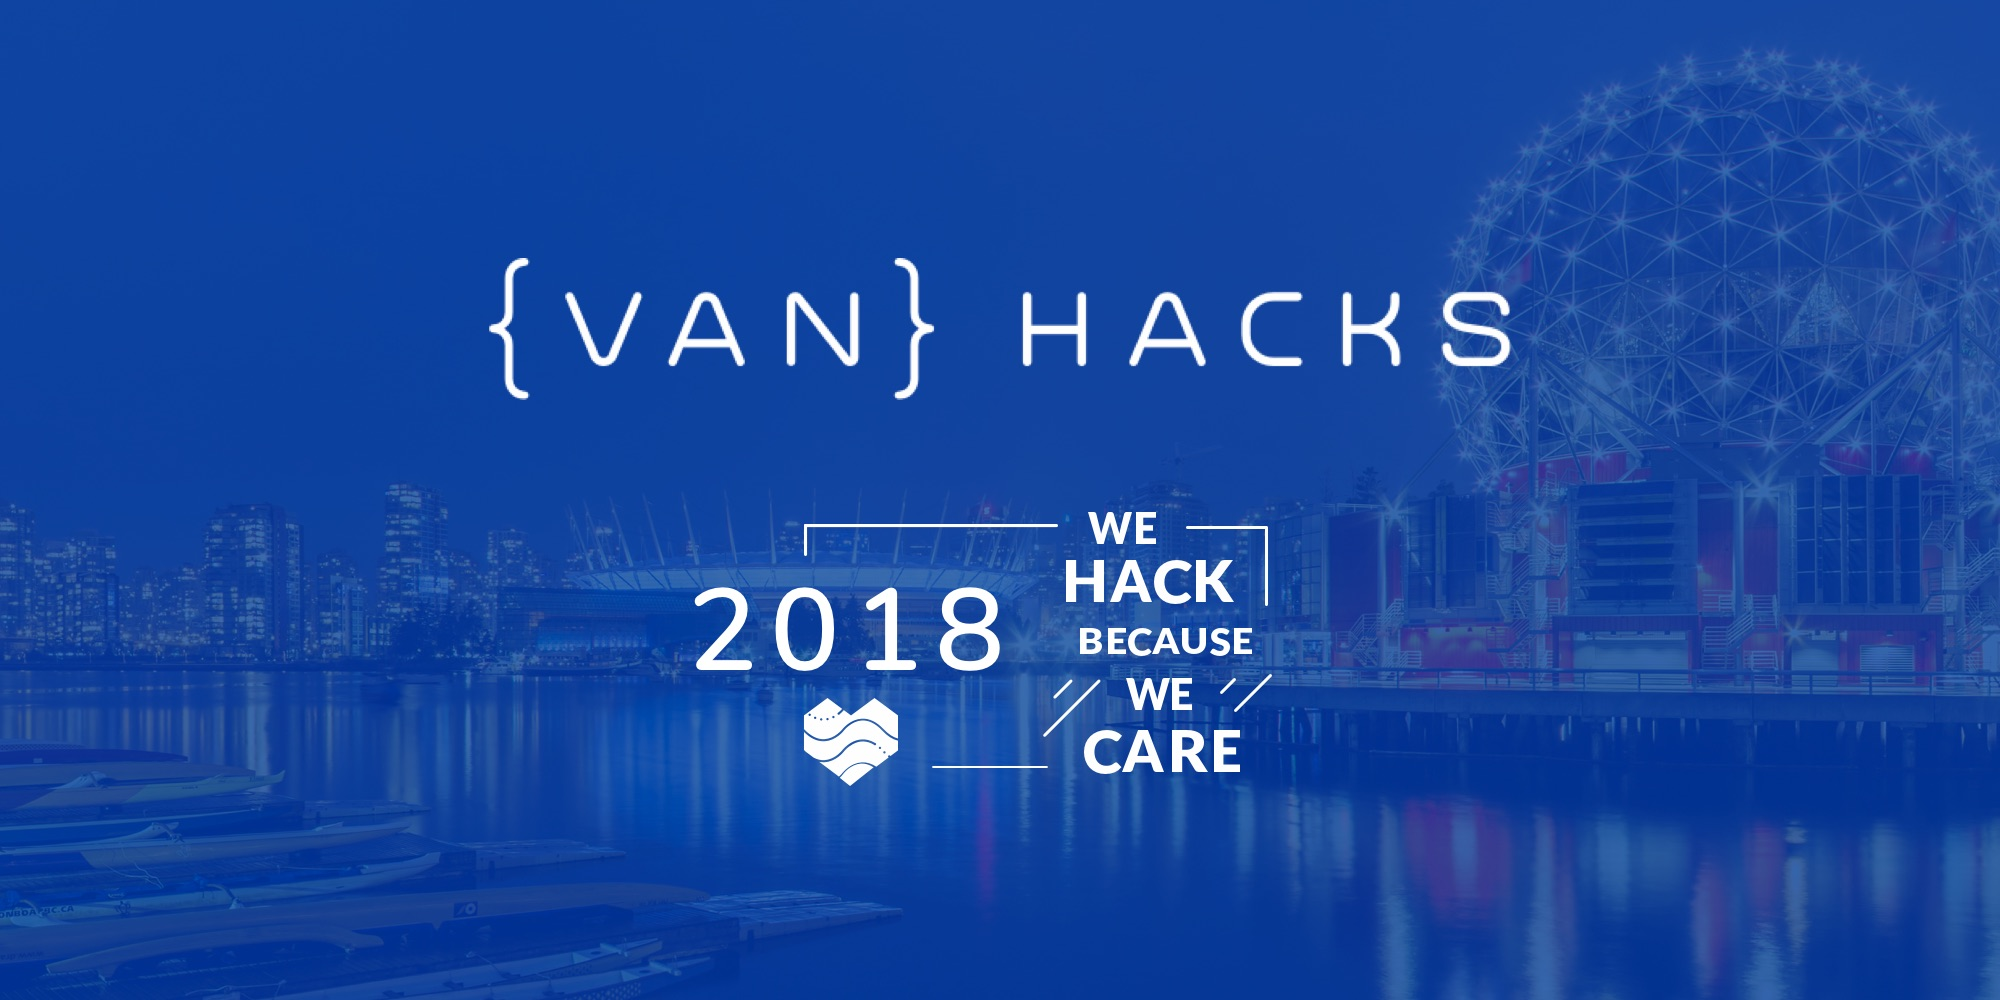 VanHacks: a hackathon for social good